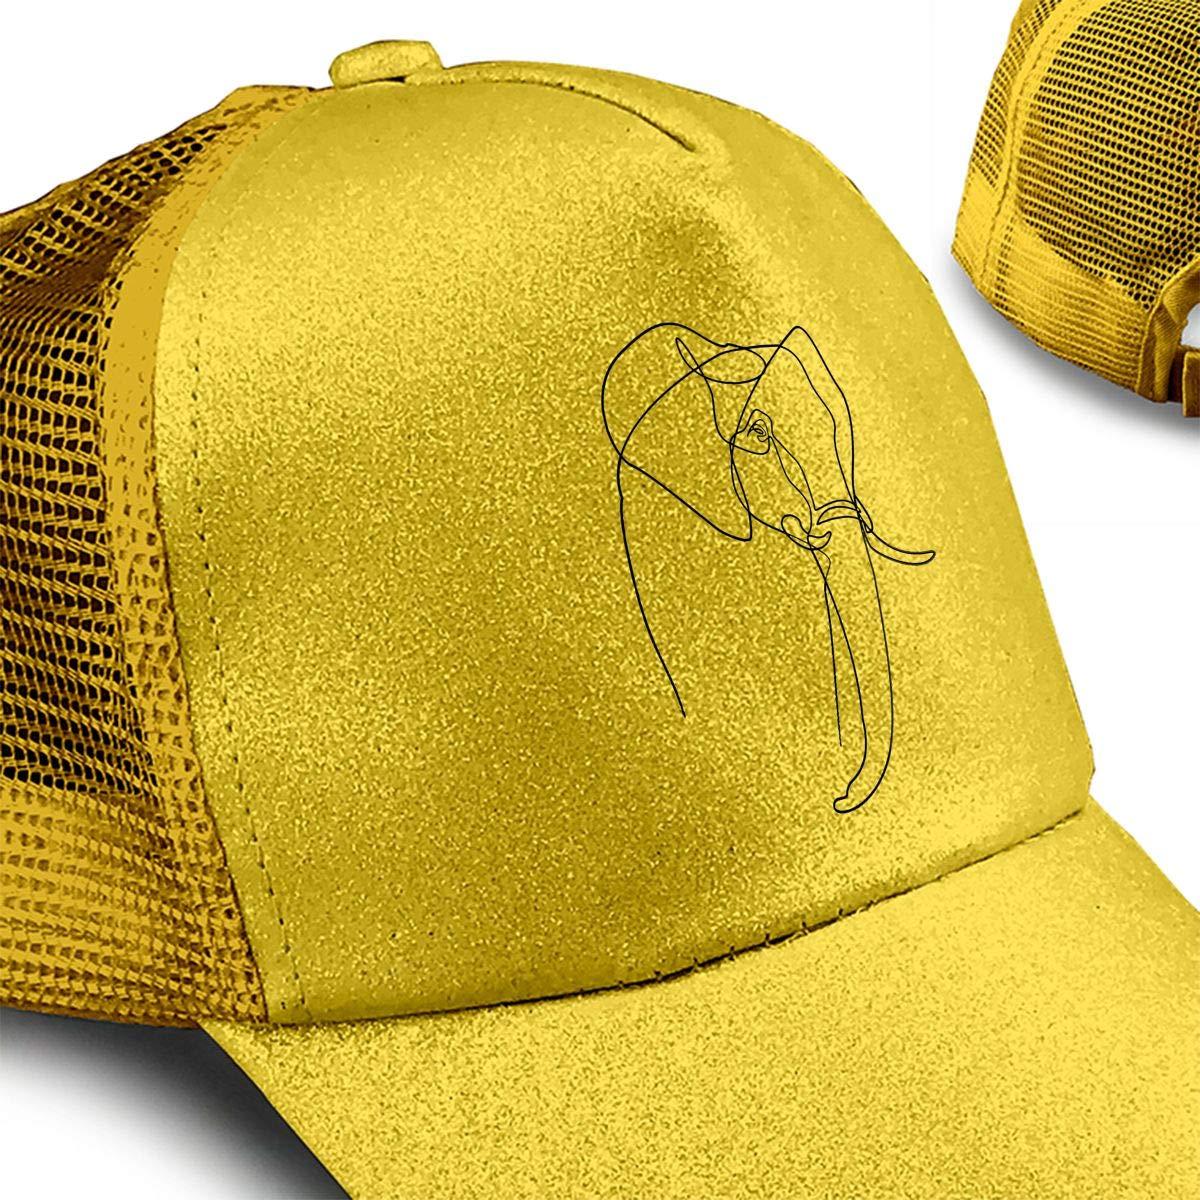 Elephant Heart LINE Ponytail Messy High Bun Hat Ponycaps Baseball Cap Adjustable Trucker Cap Mesh Cap